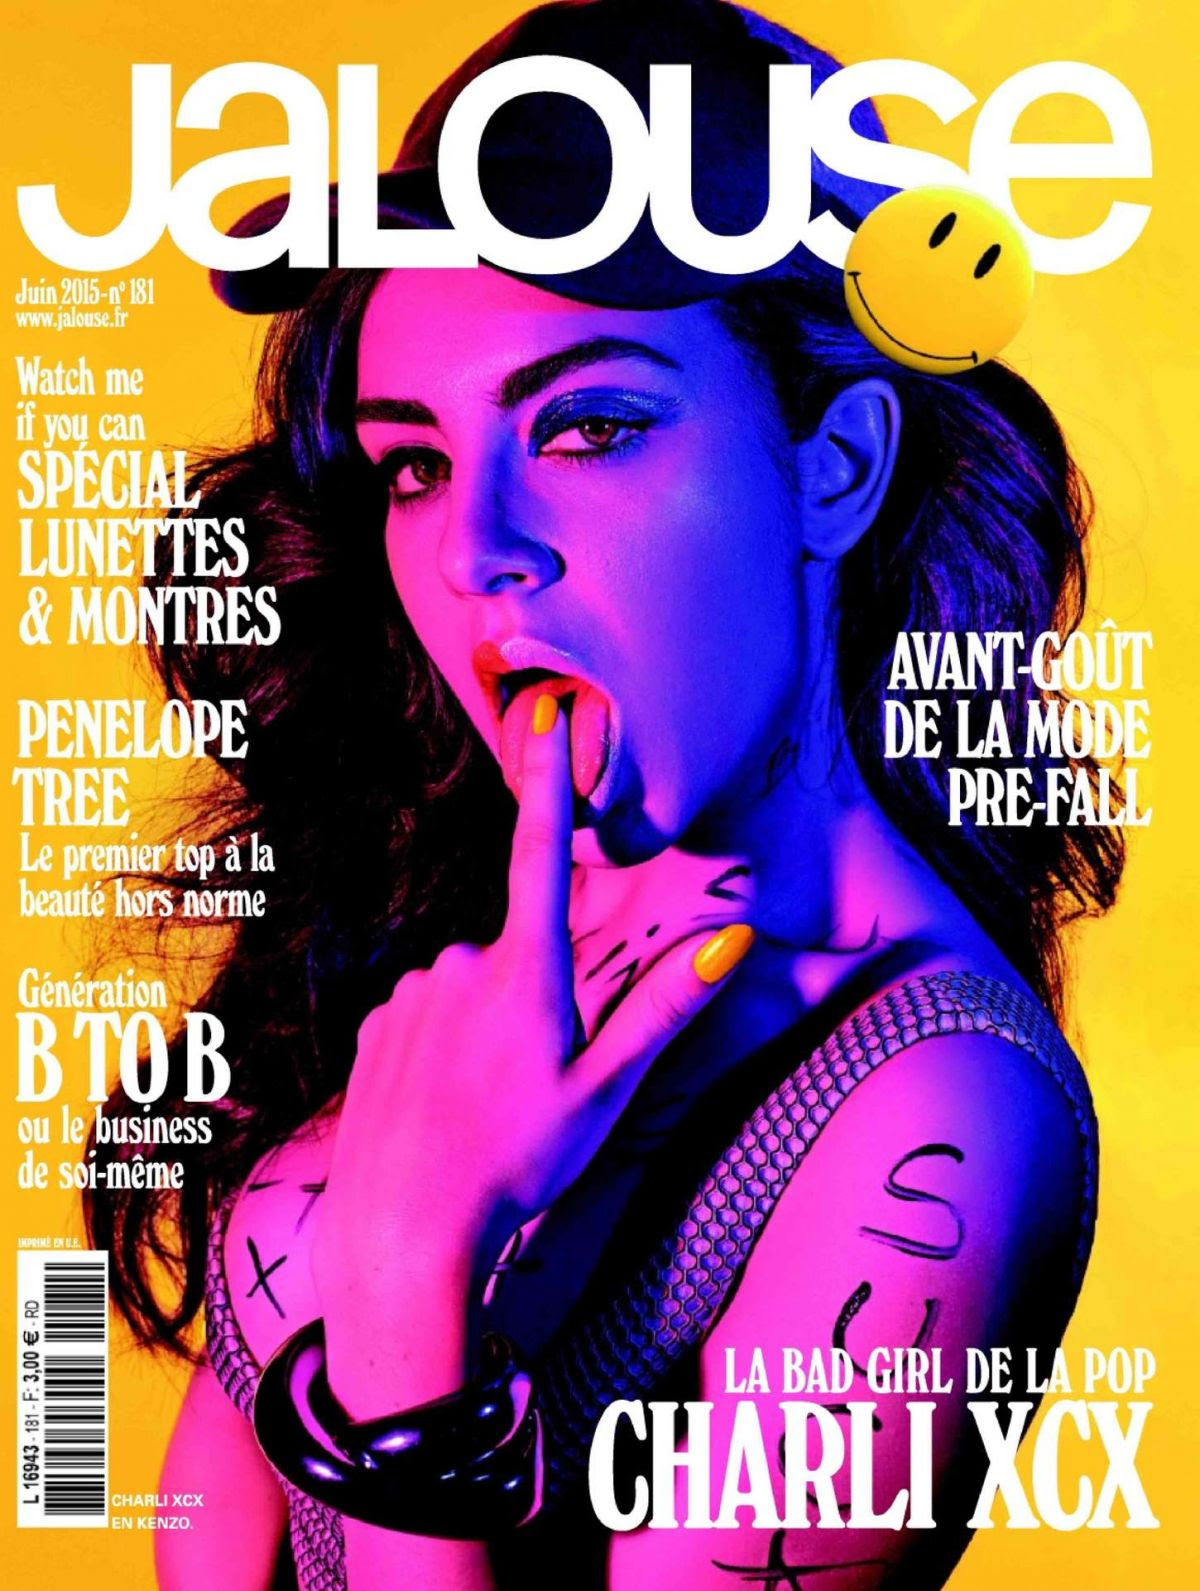 CHARLI XCX in Jalouse Magazine, June 2015 Issue